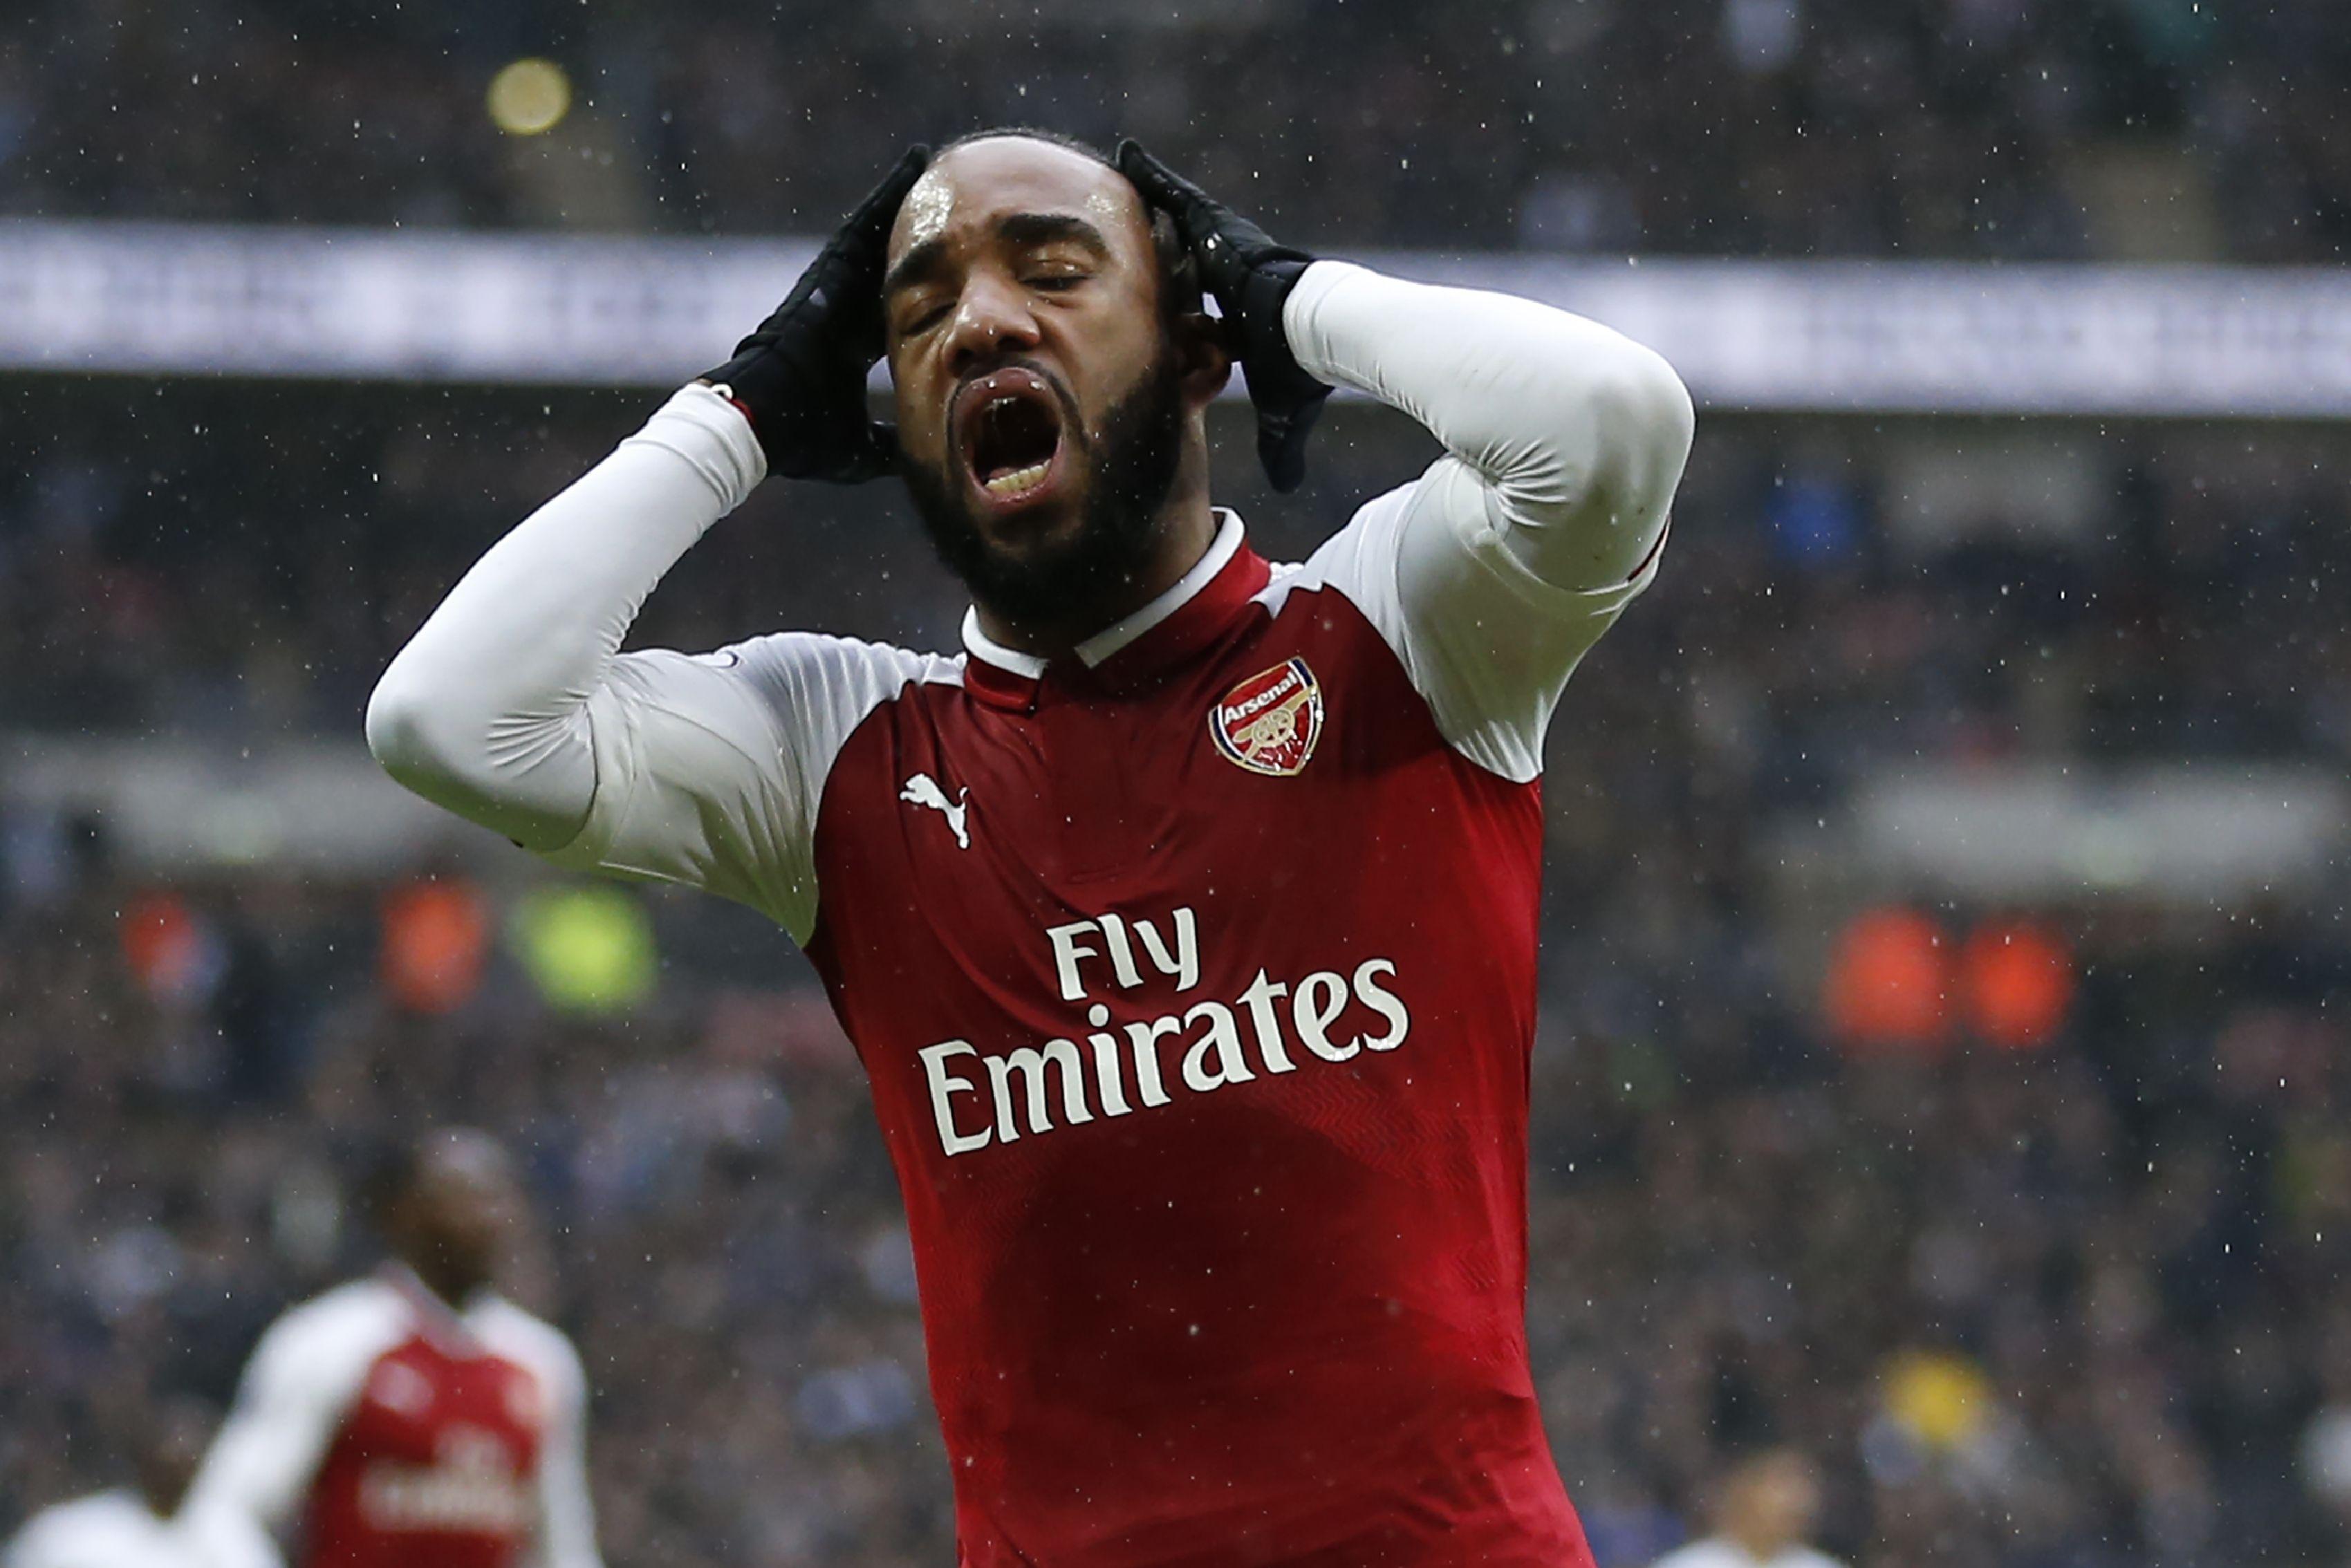 Bitter: Alexandre Lacazette wird Arsenal London lange fehlen.